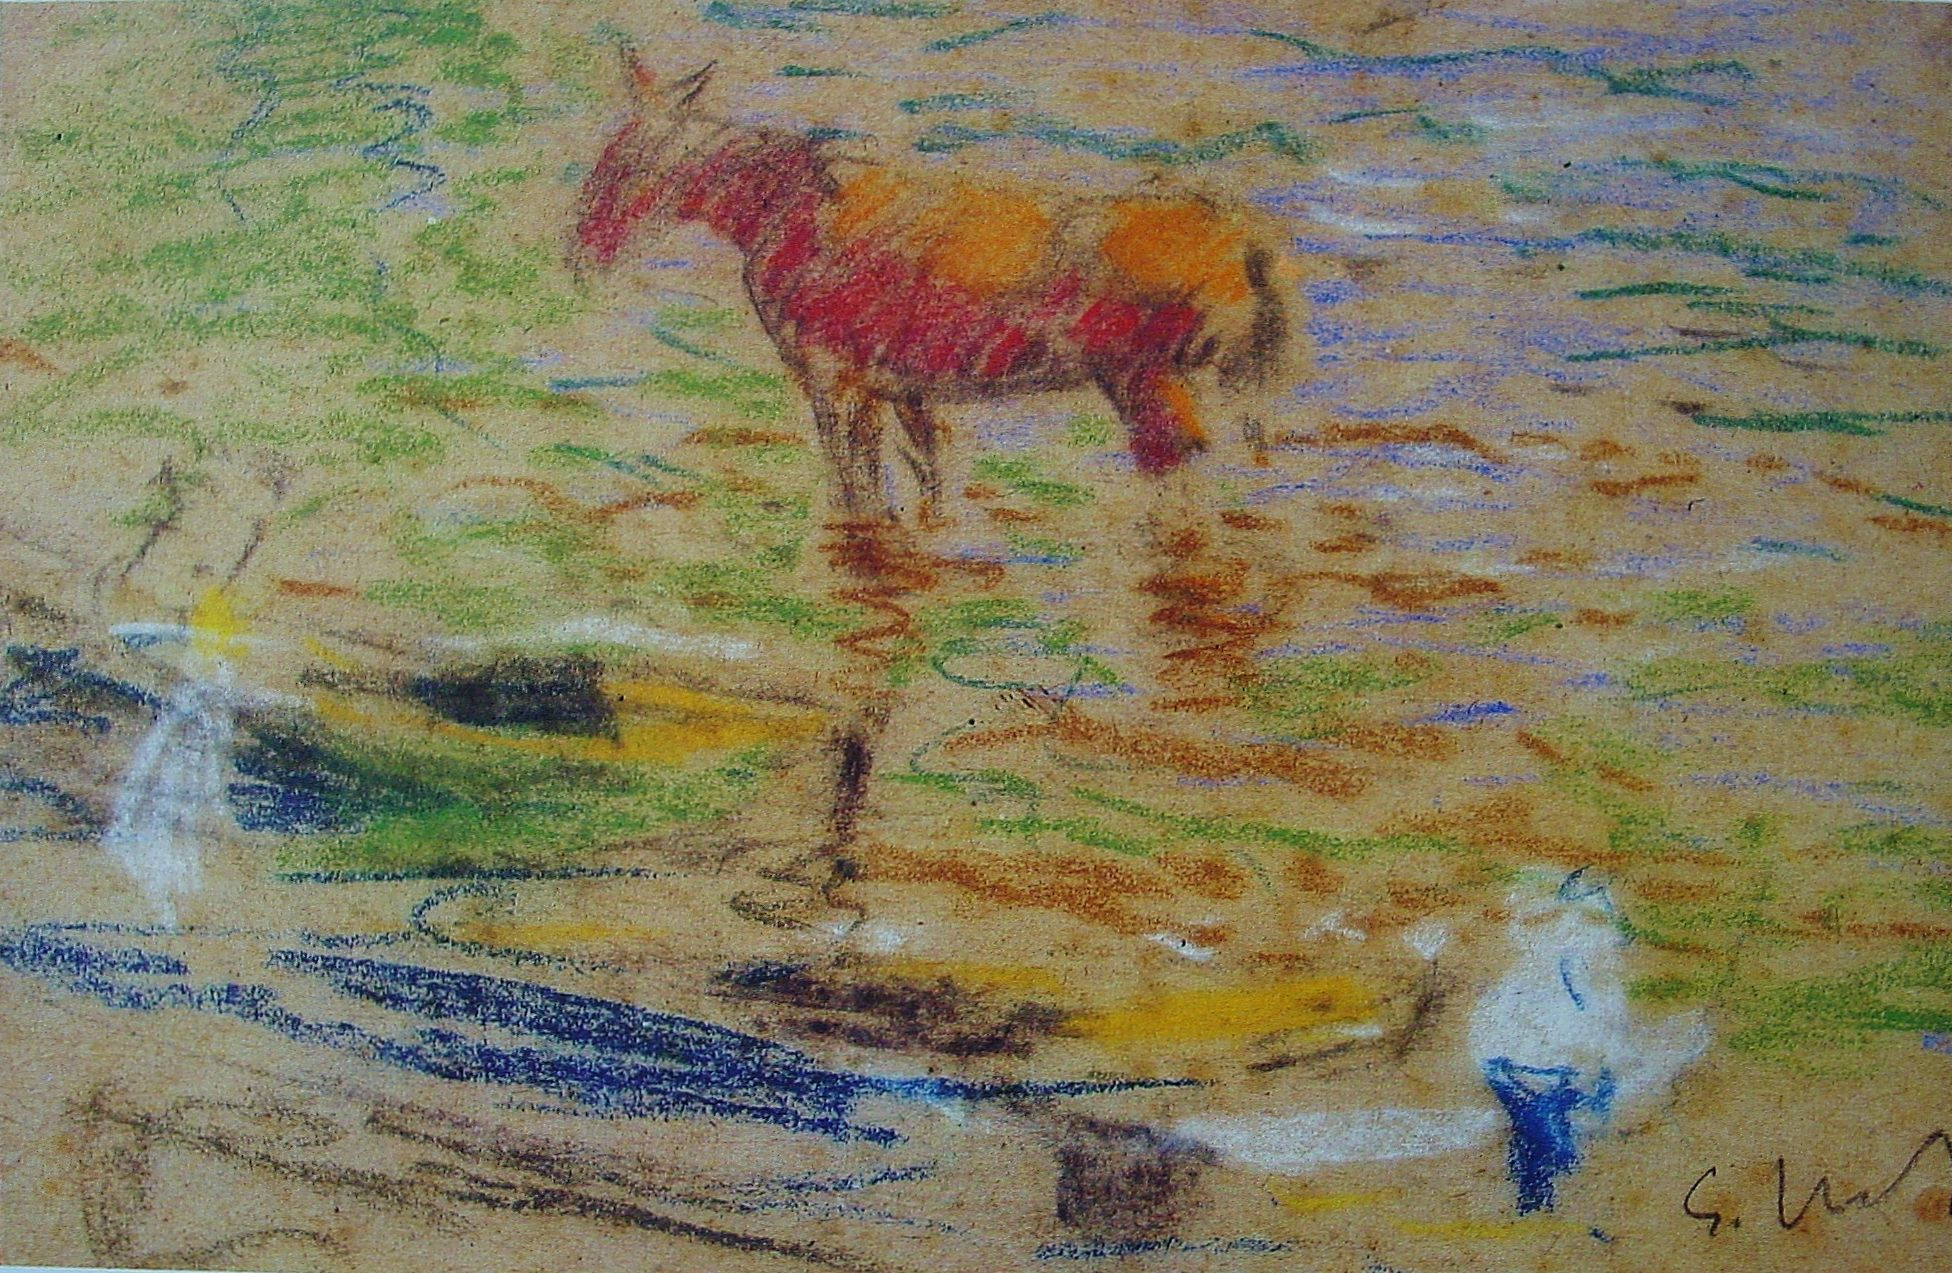 Eliseo Meifrén Roig. Caballo en la playa. Dibujo al pastel sobre papel. Firmado. 19,5 x 27 cm. Ausa, p. 410.